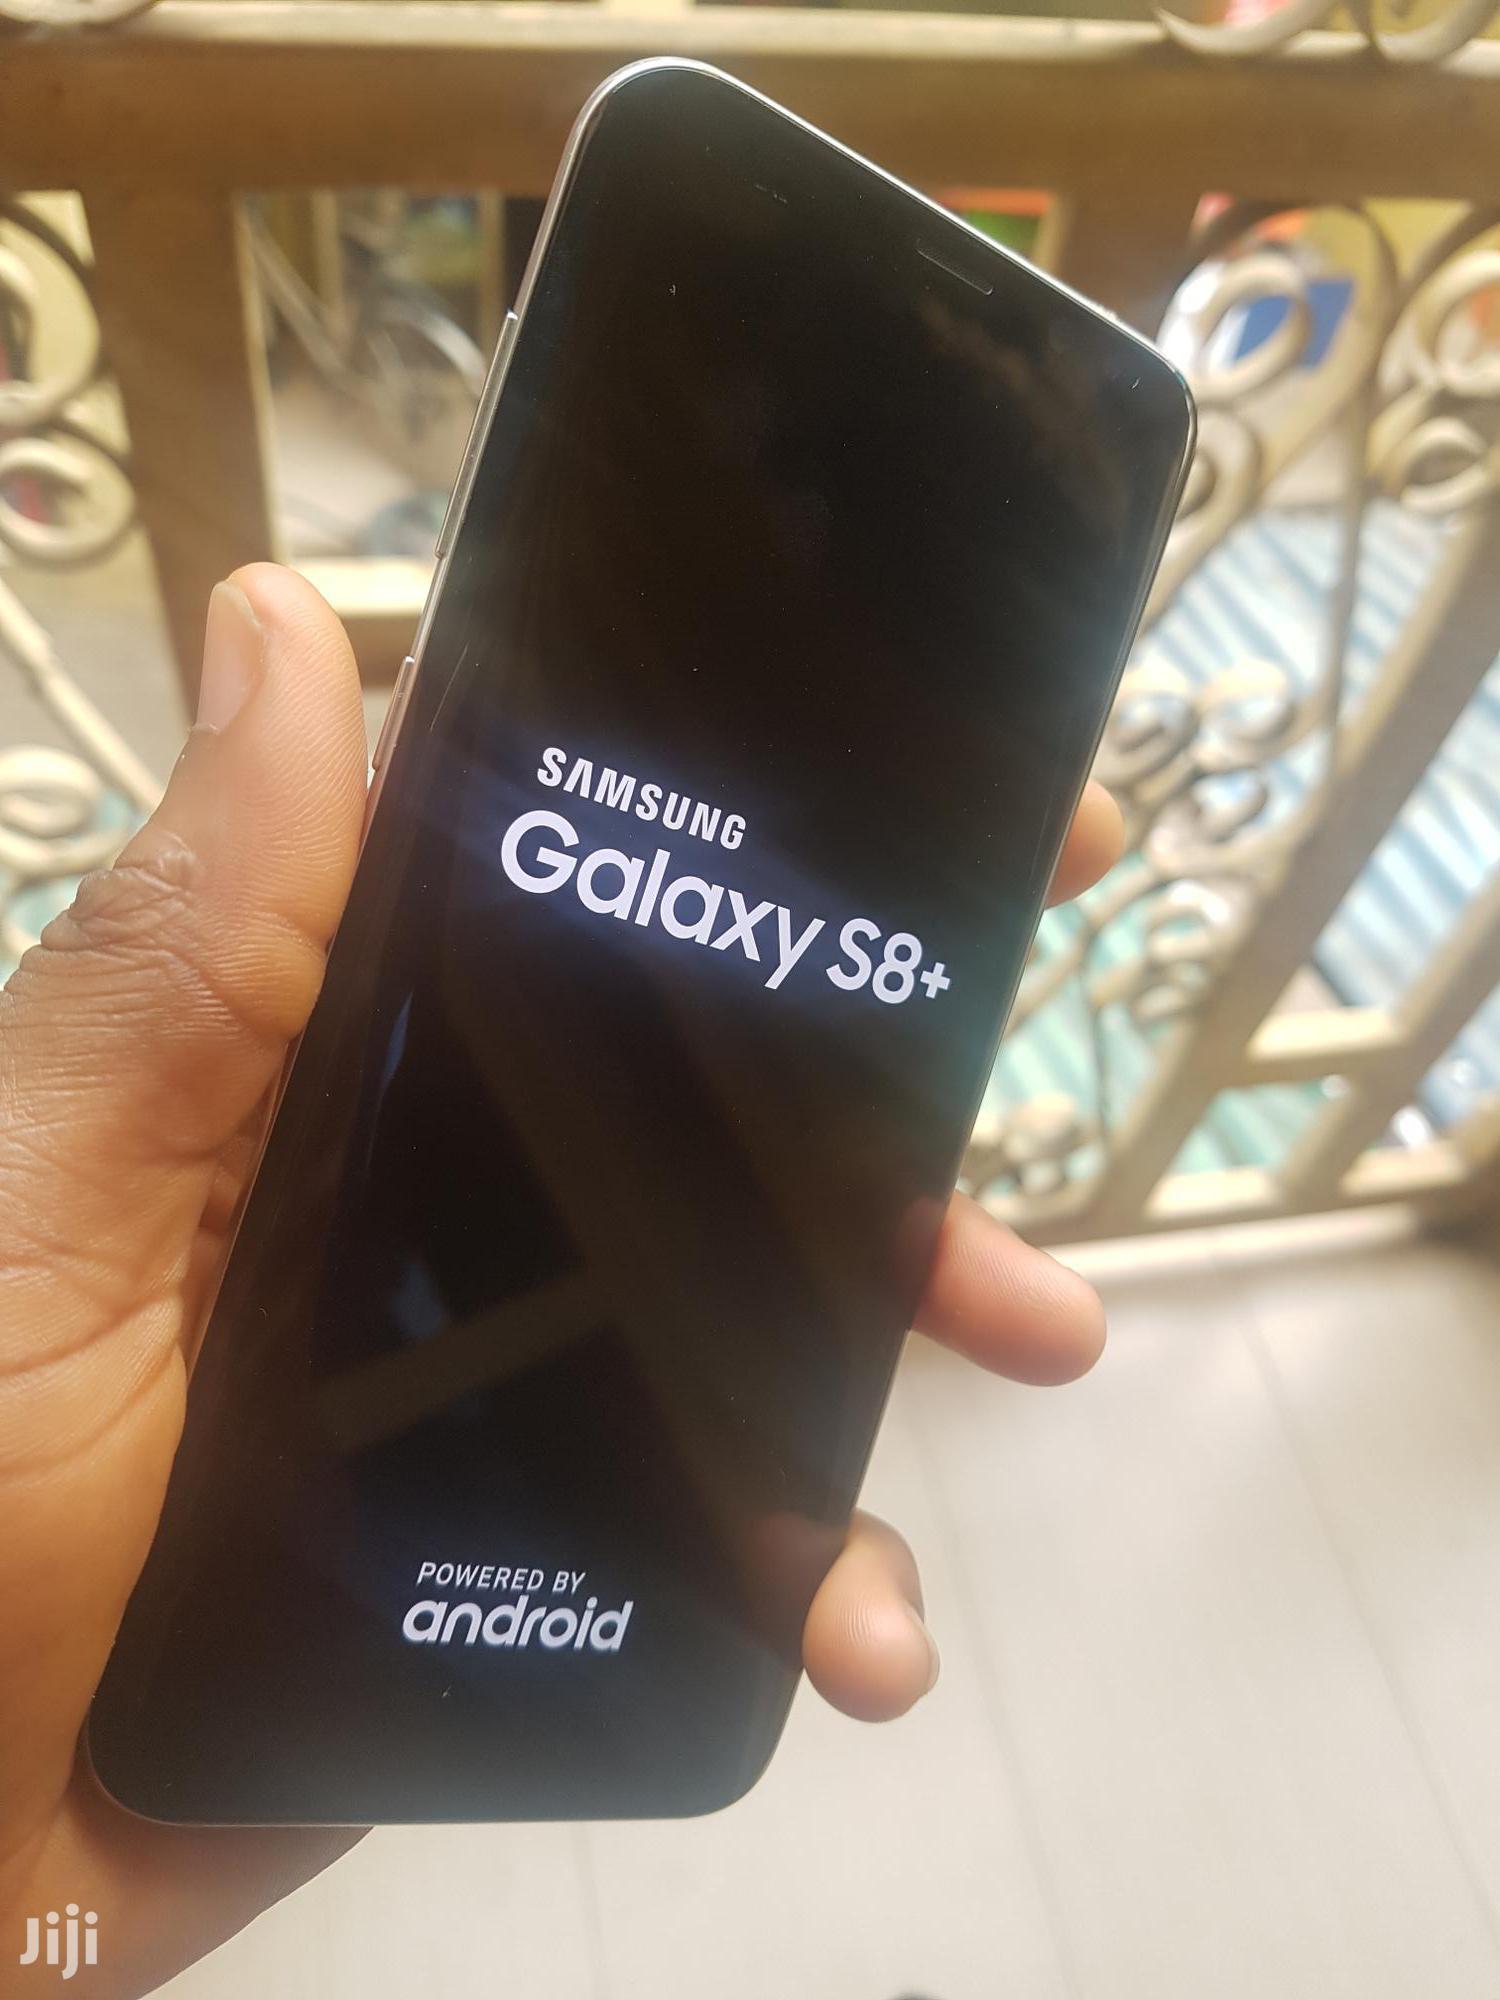 Samsung Galaxy S8 Plus 128 GB Black | Mobile Phones for sale in Benin City, Edo State, Nigeria